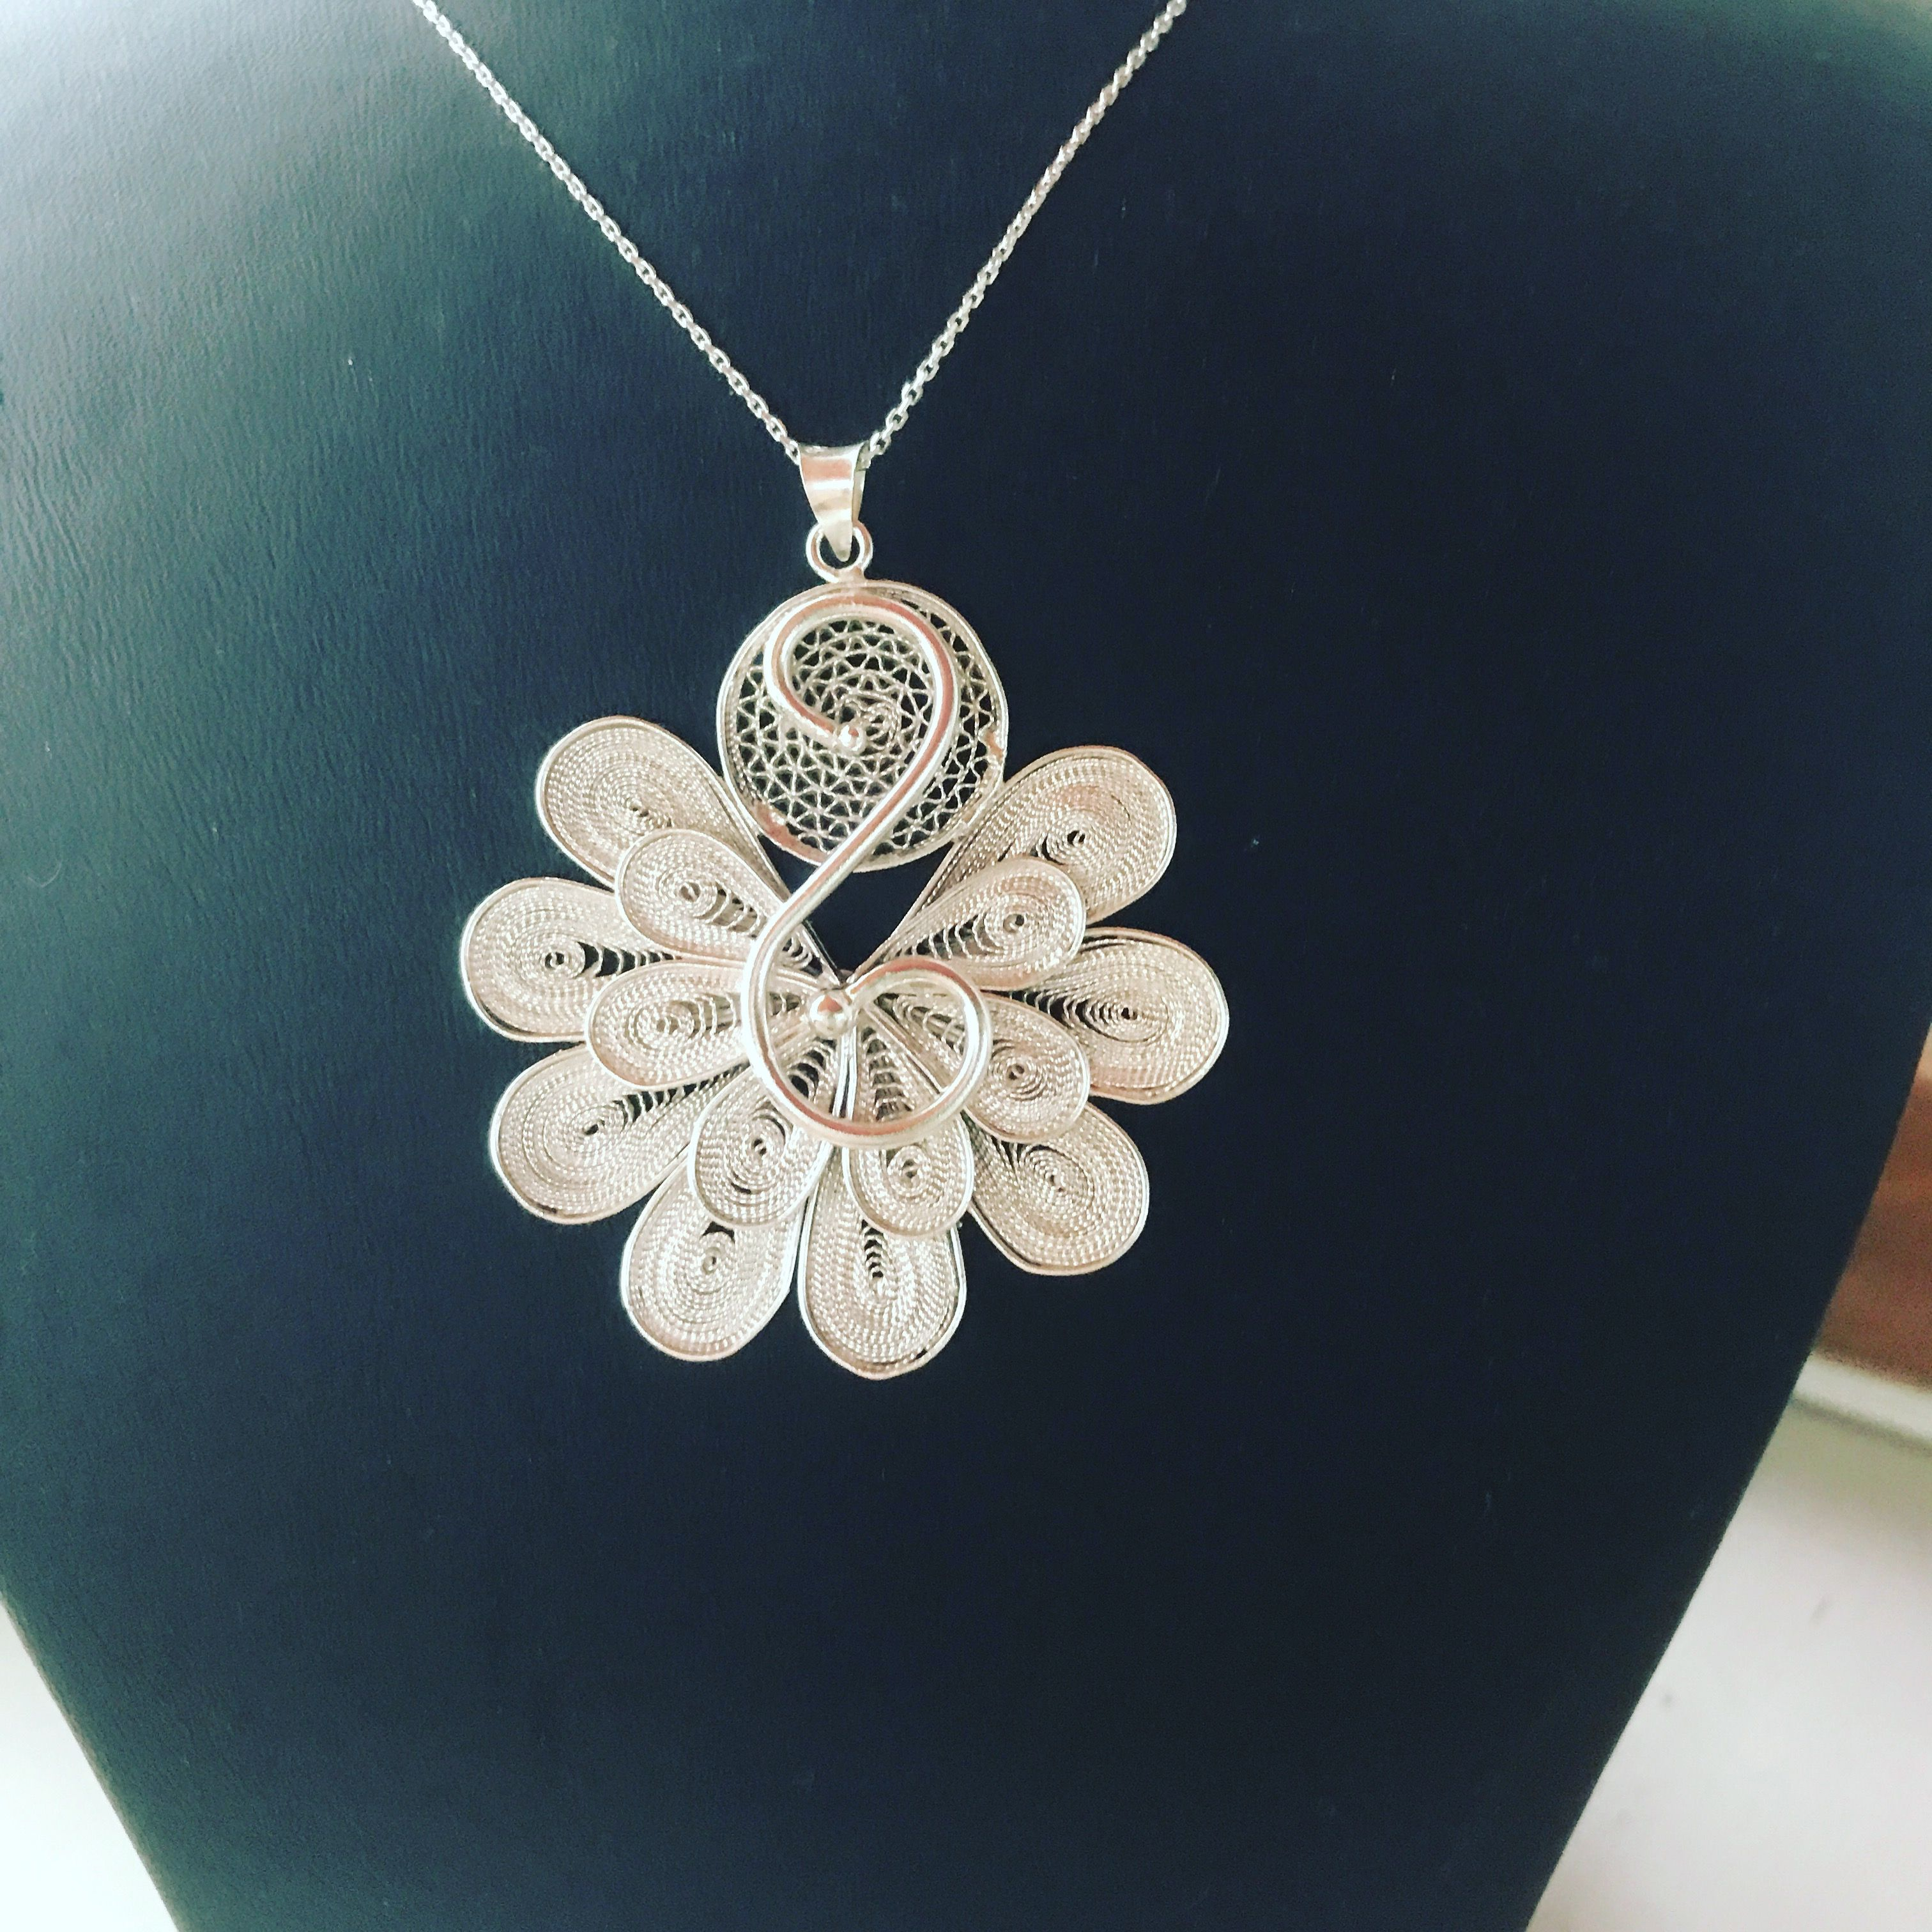 925 Sterling Silver Telkari Necklace